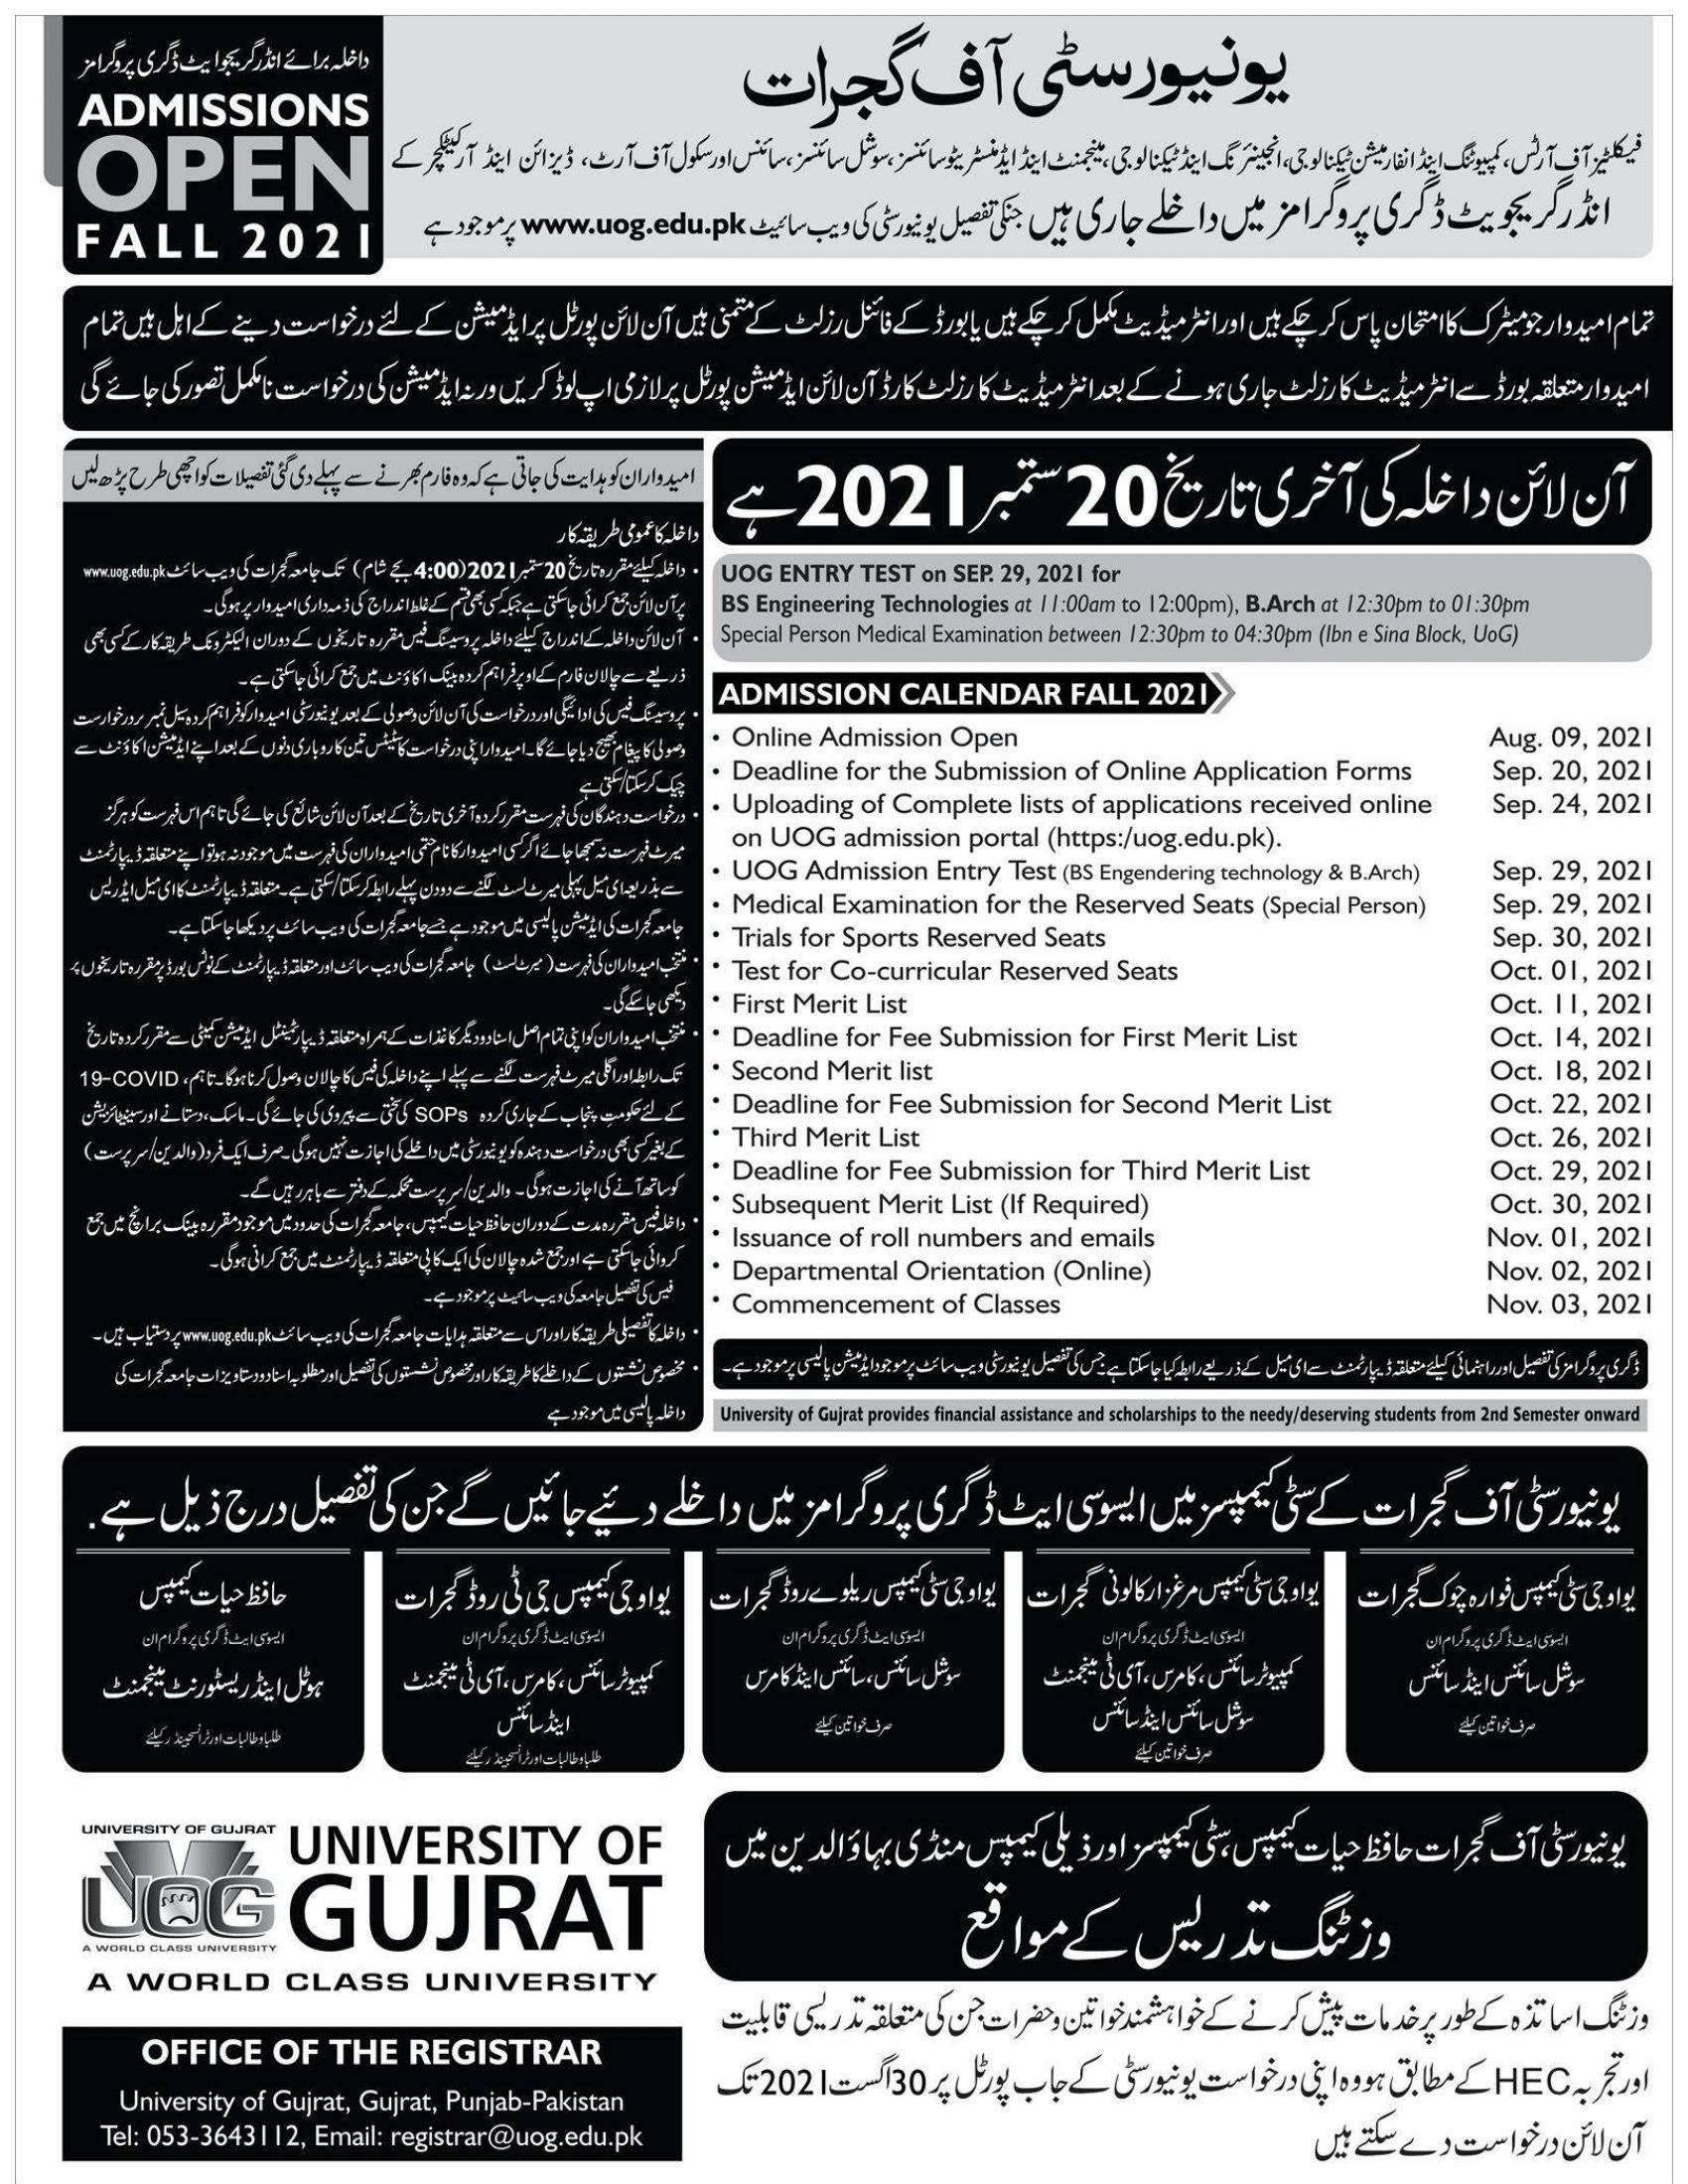 university of Gujrat admission